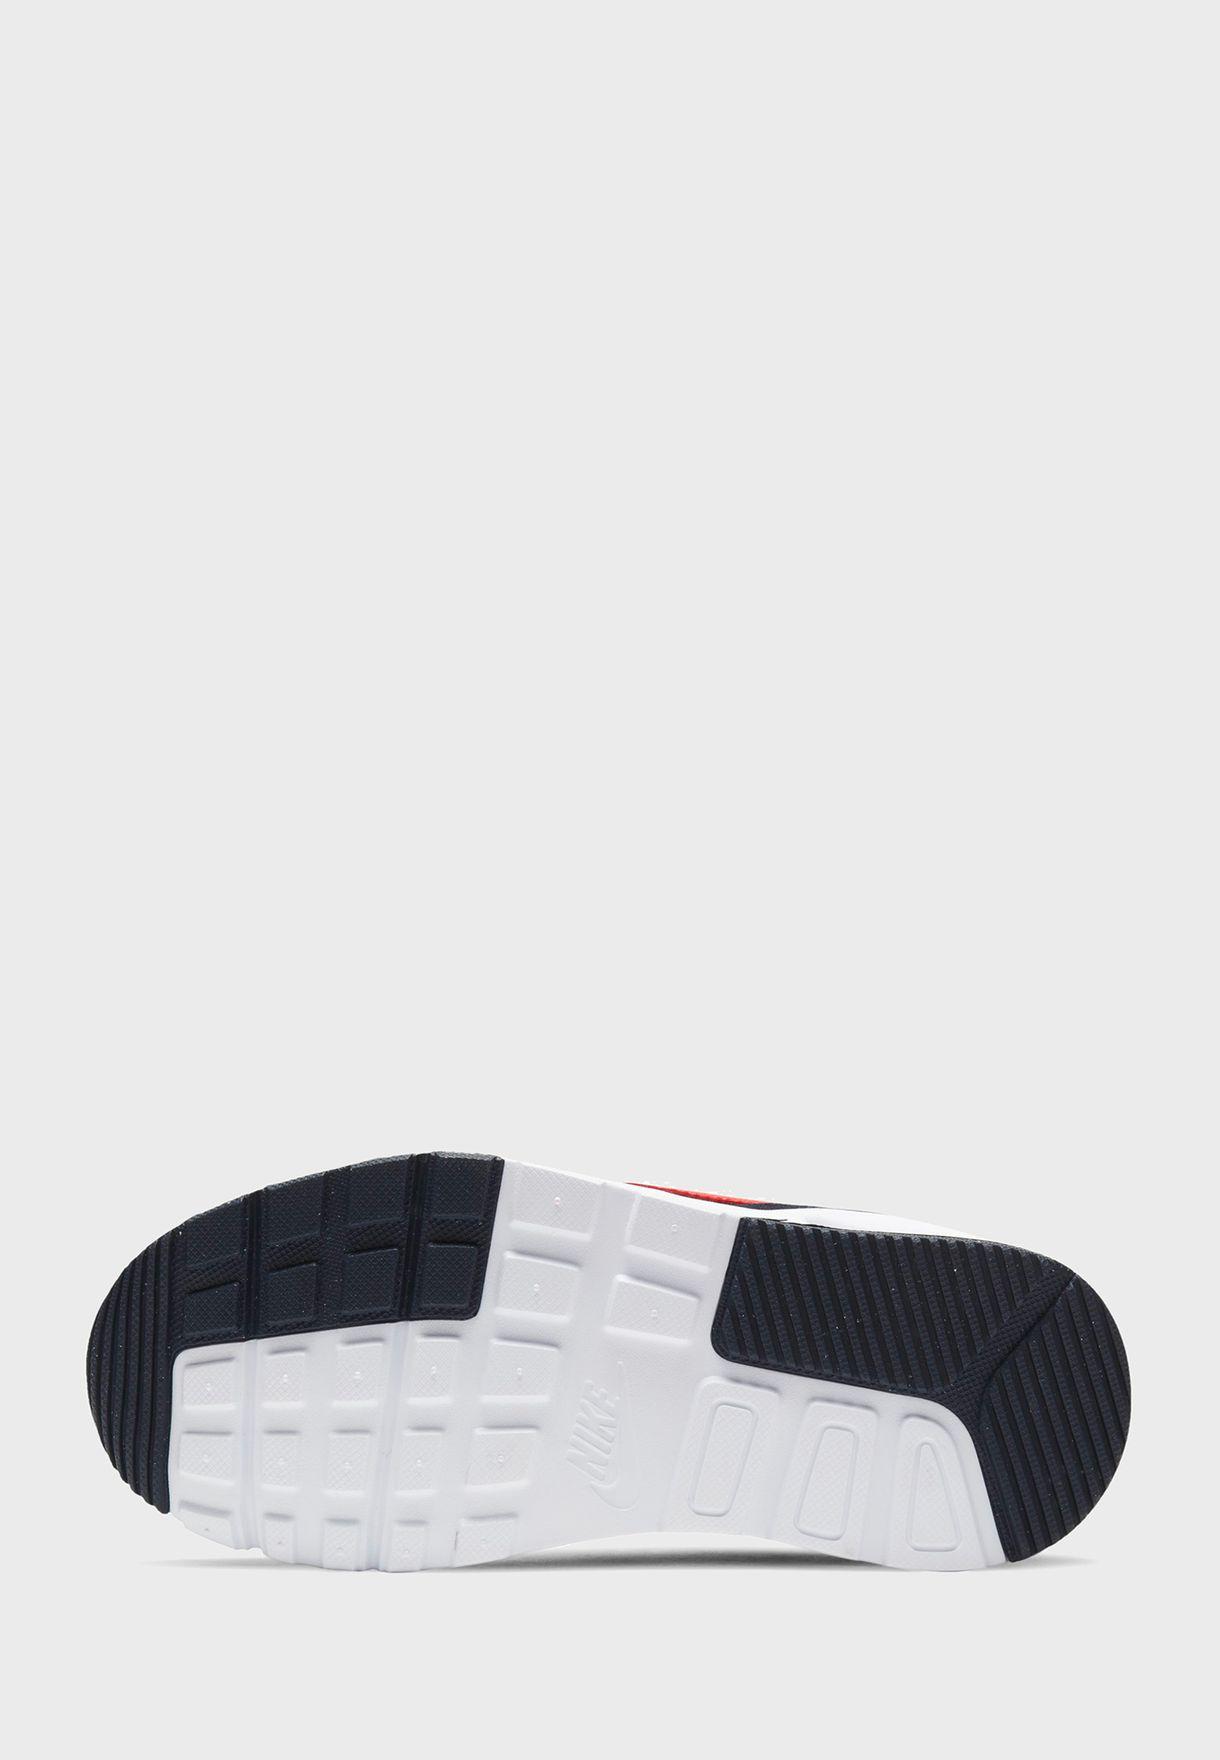 حذاء اير ماكس اس سي